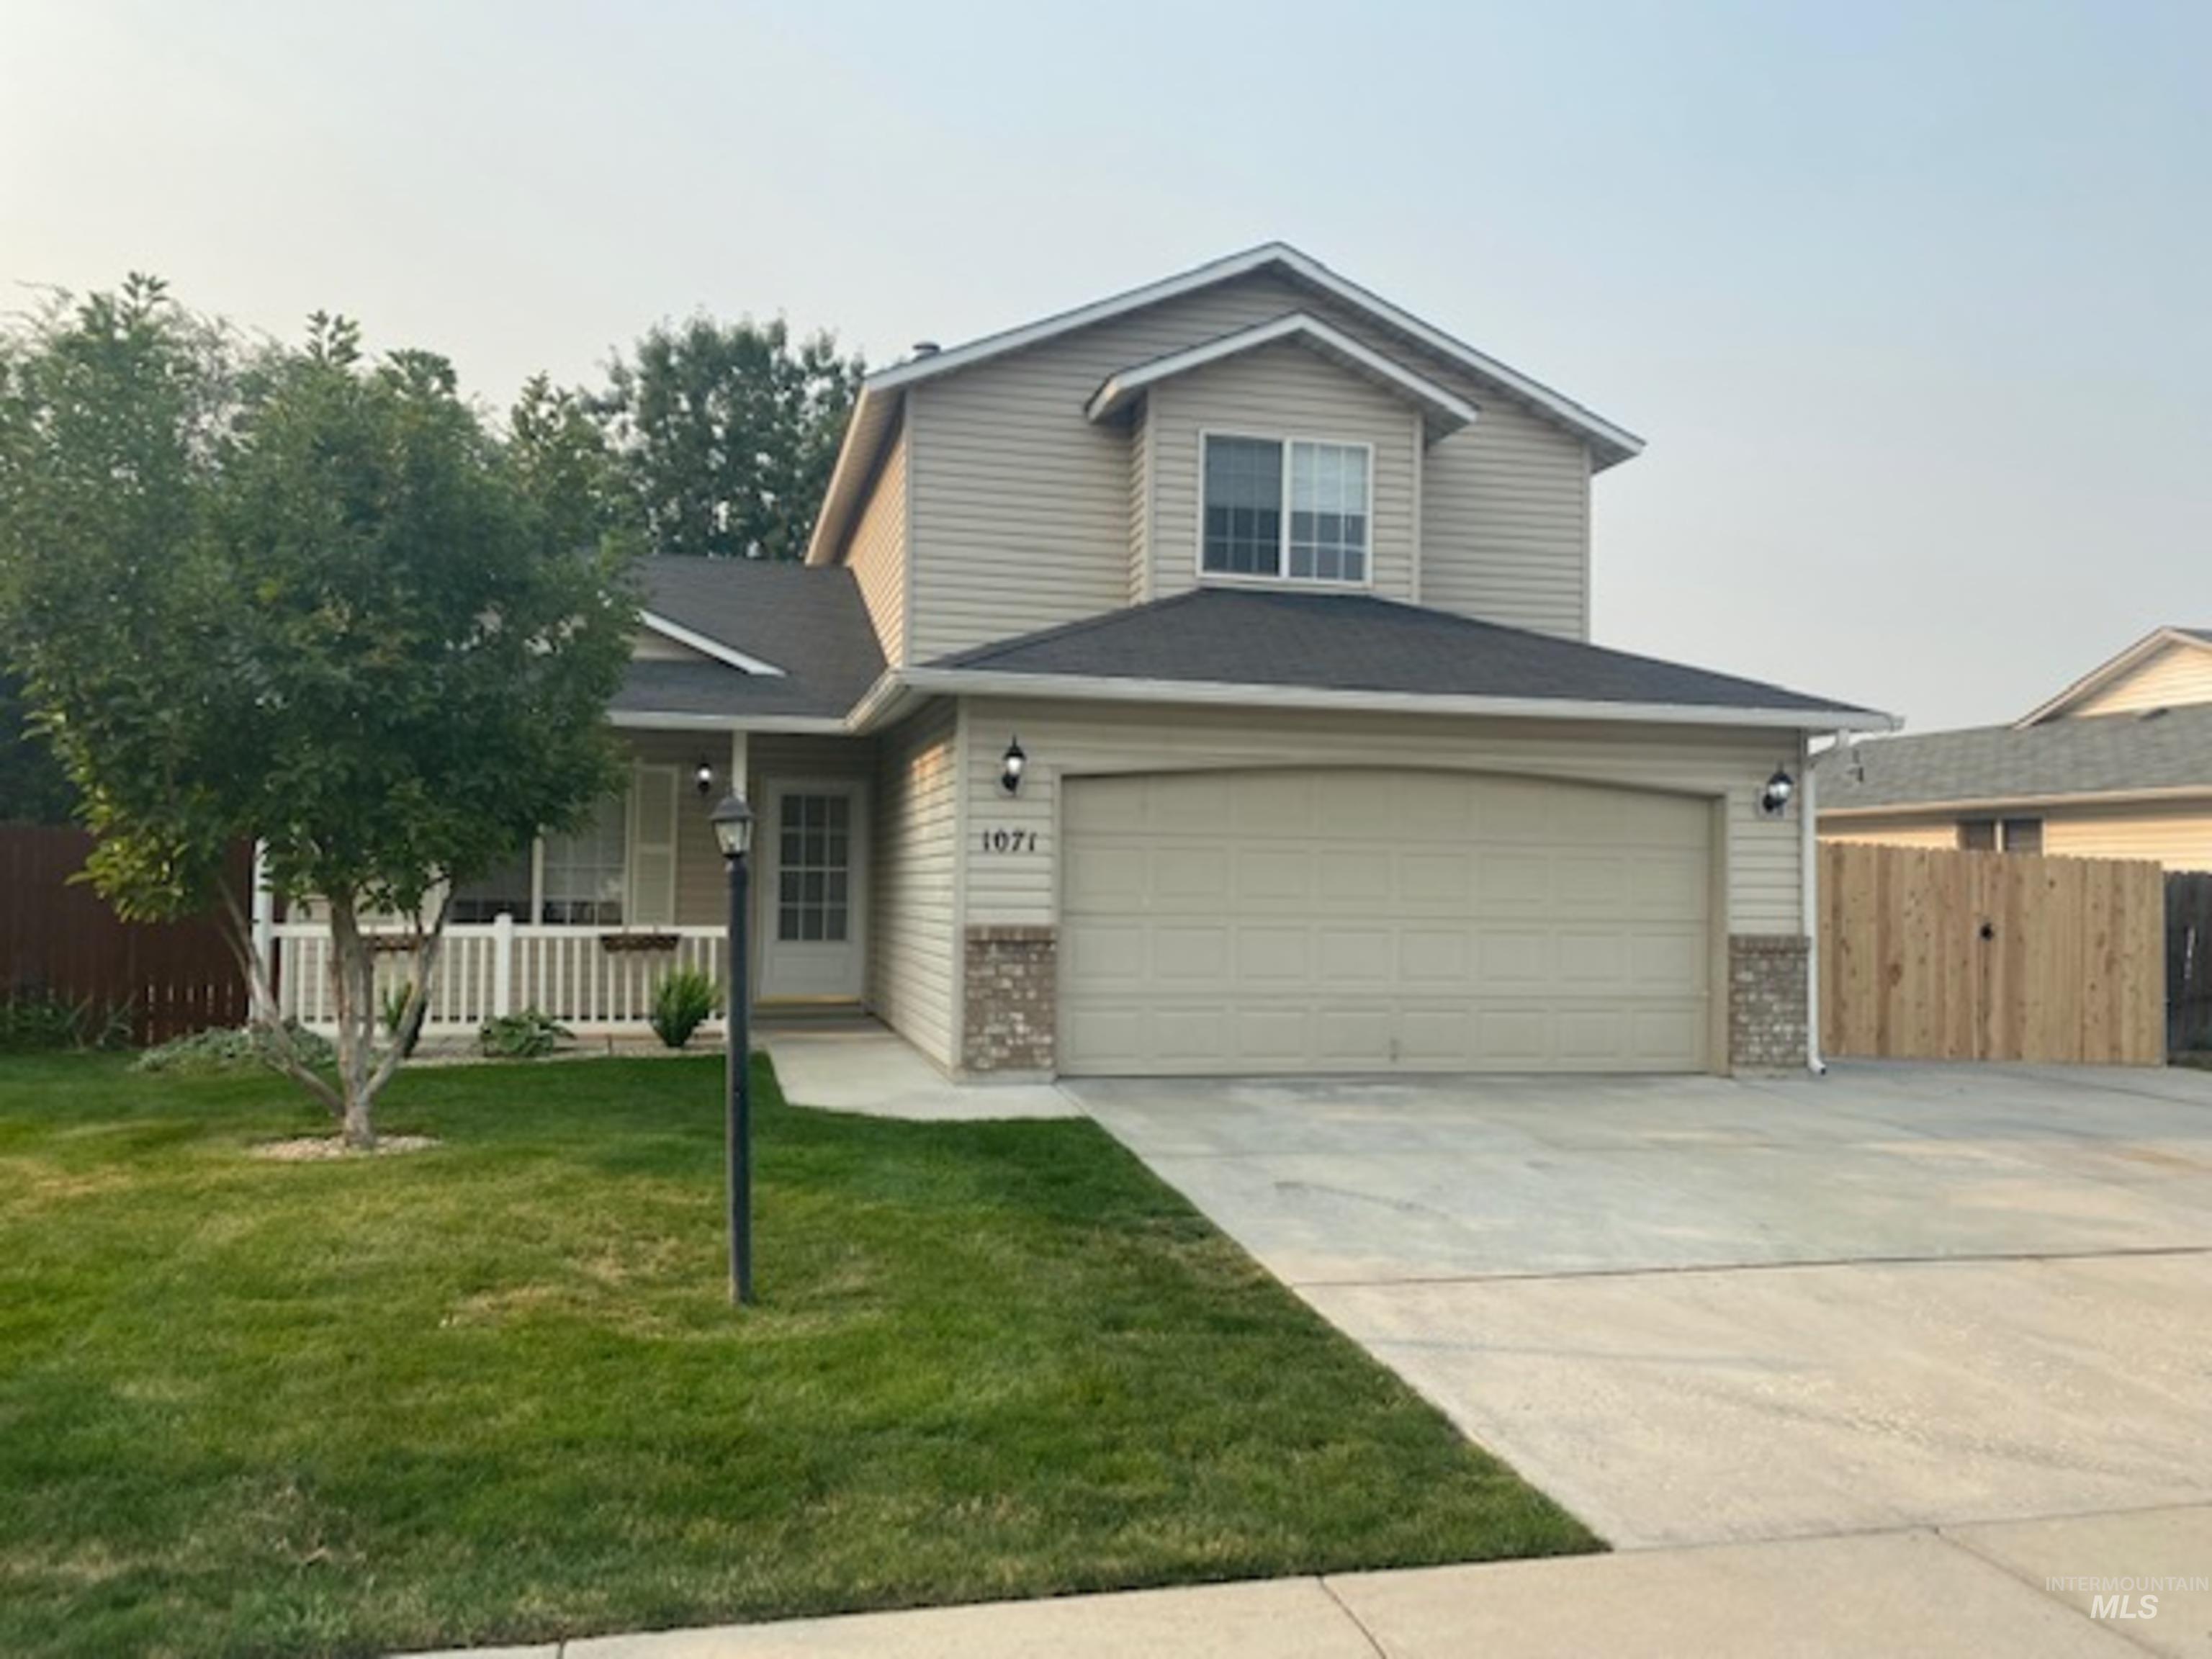 1071 W Honker Dr. Property Photo